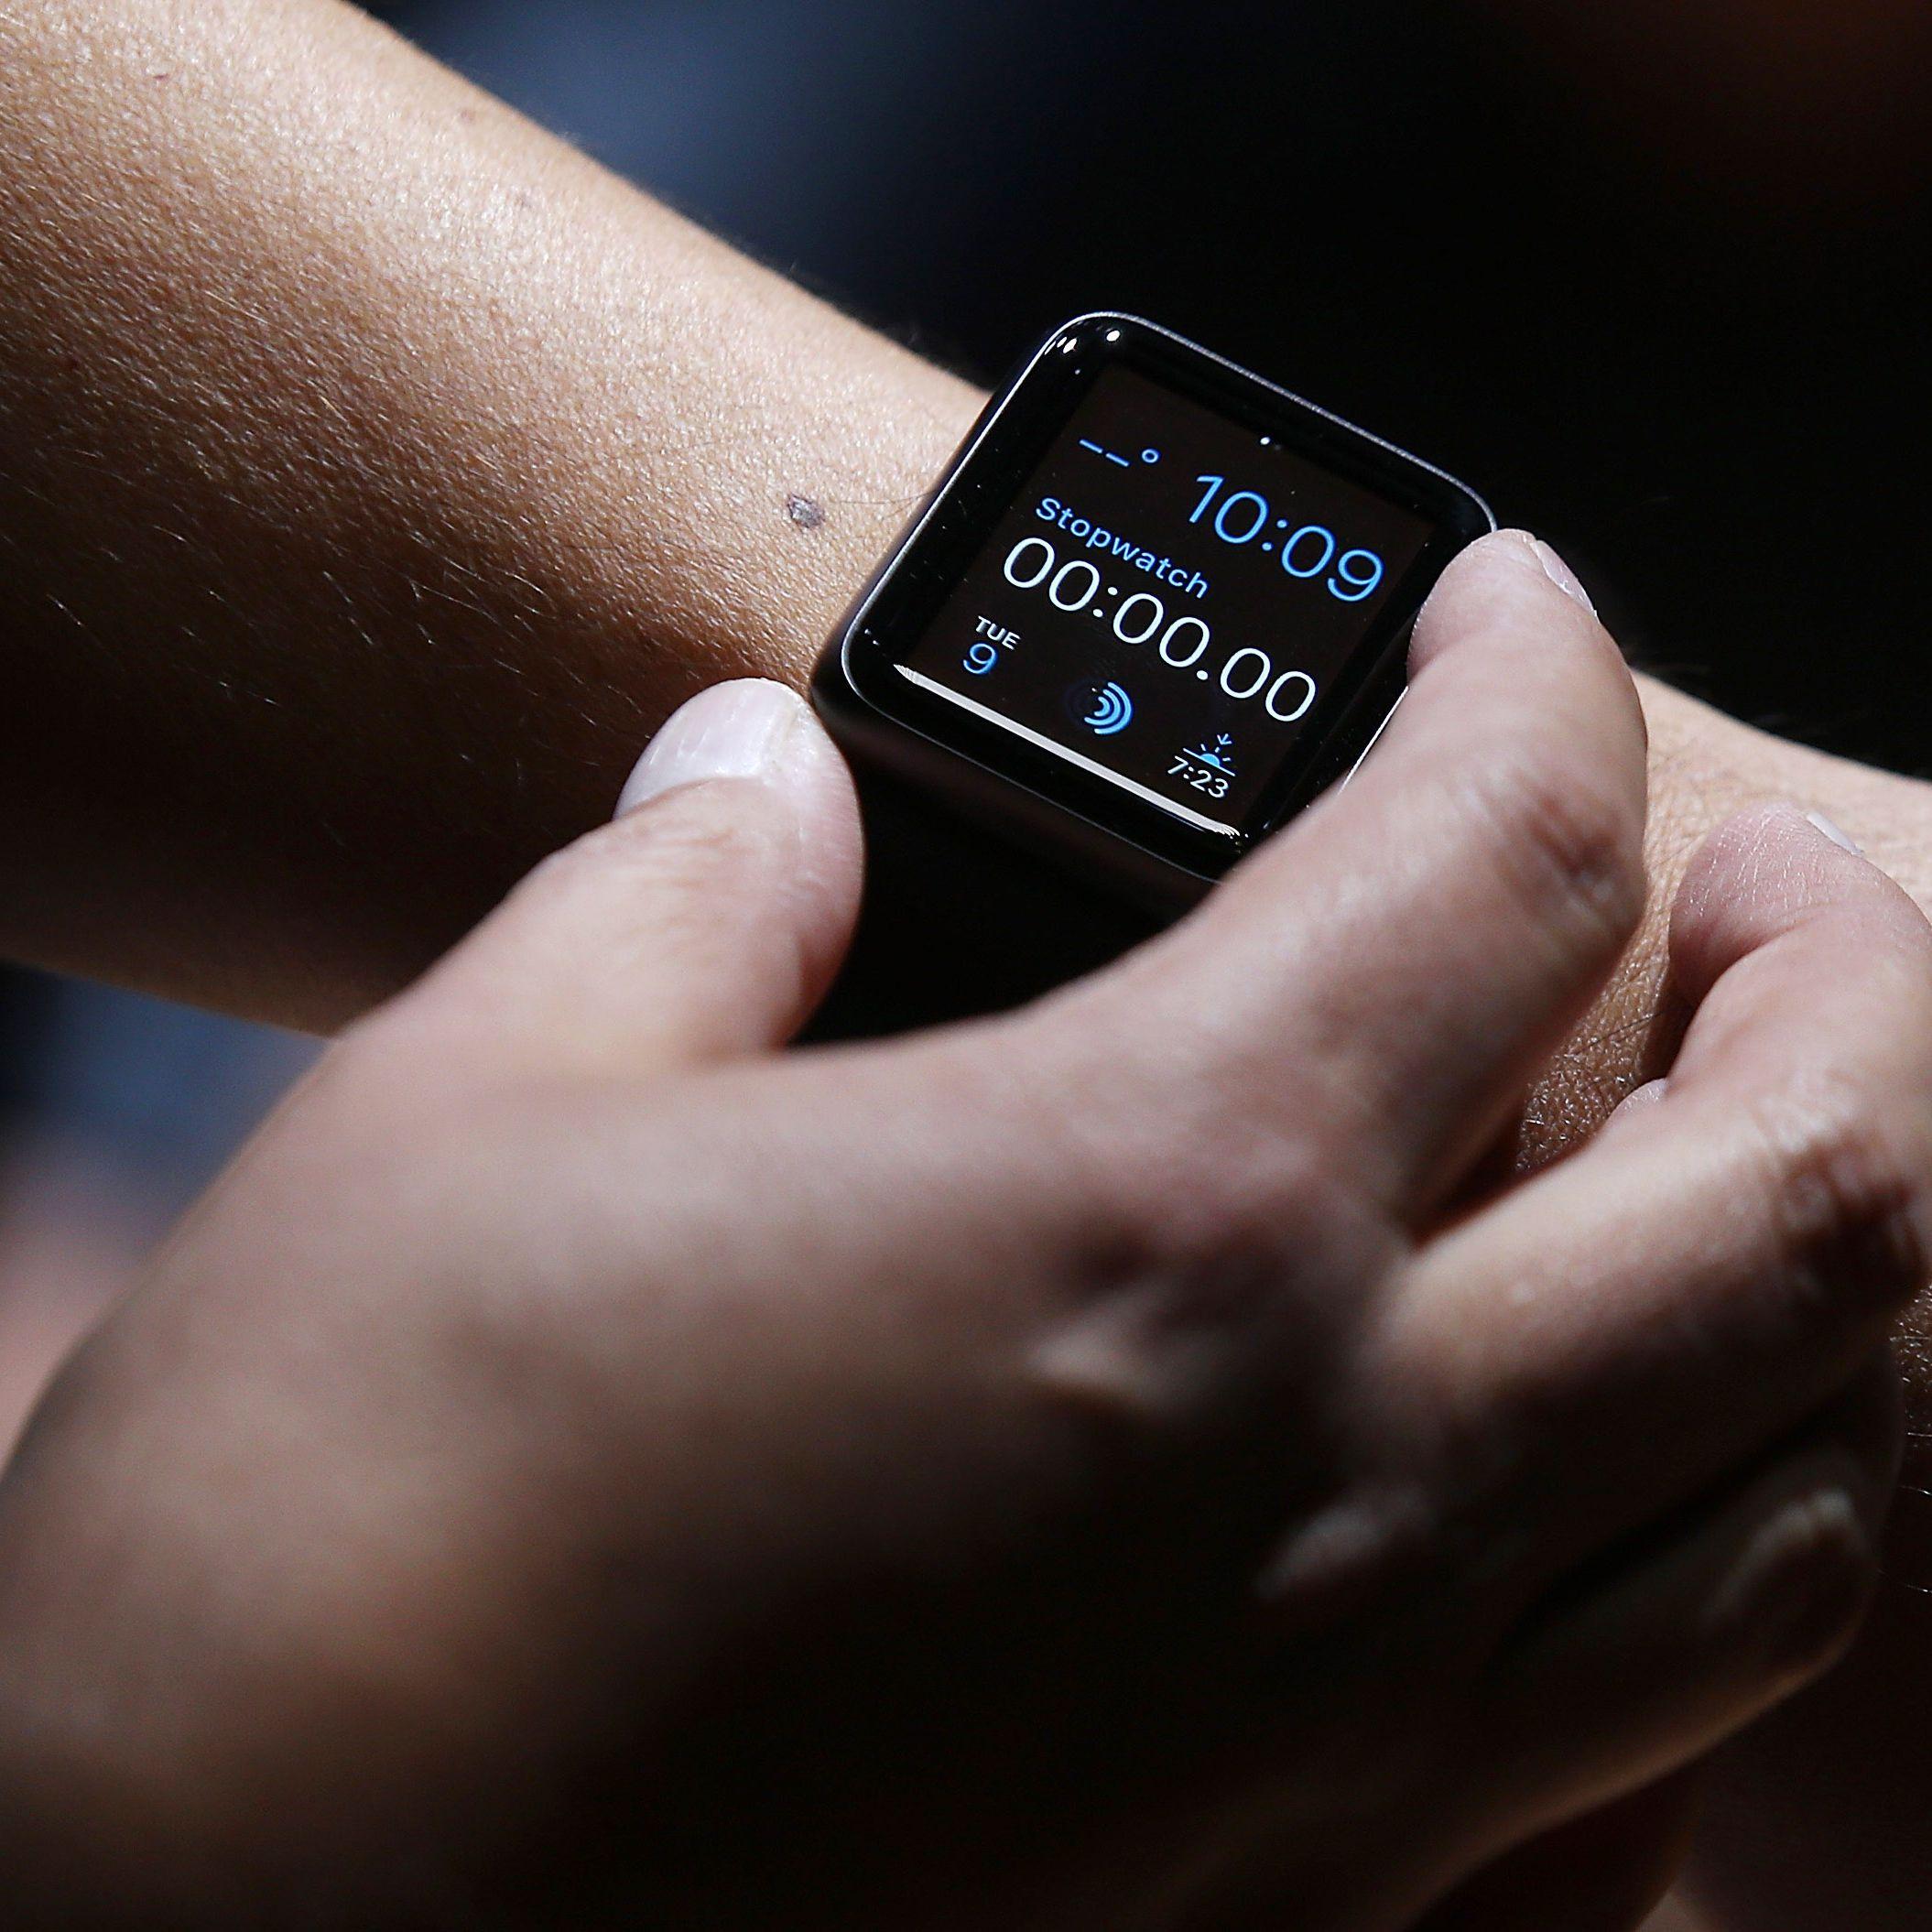 The 12 Best Apple Watch Apps of 2019